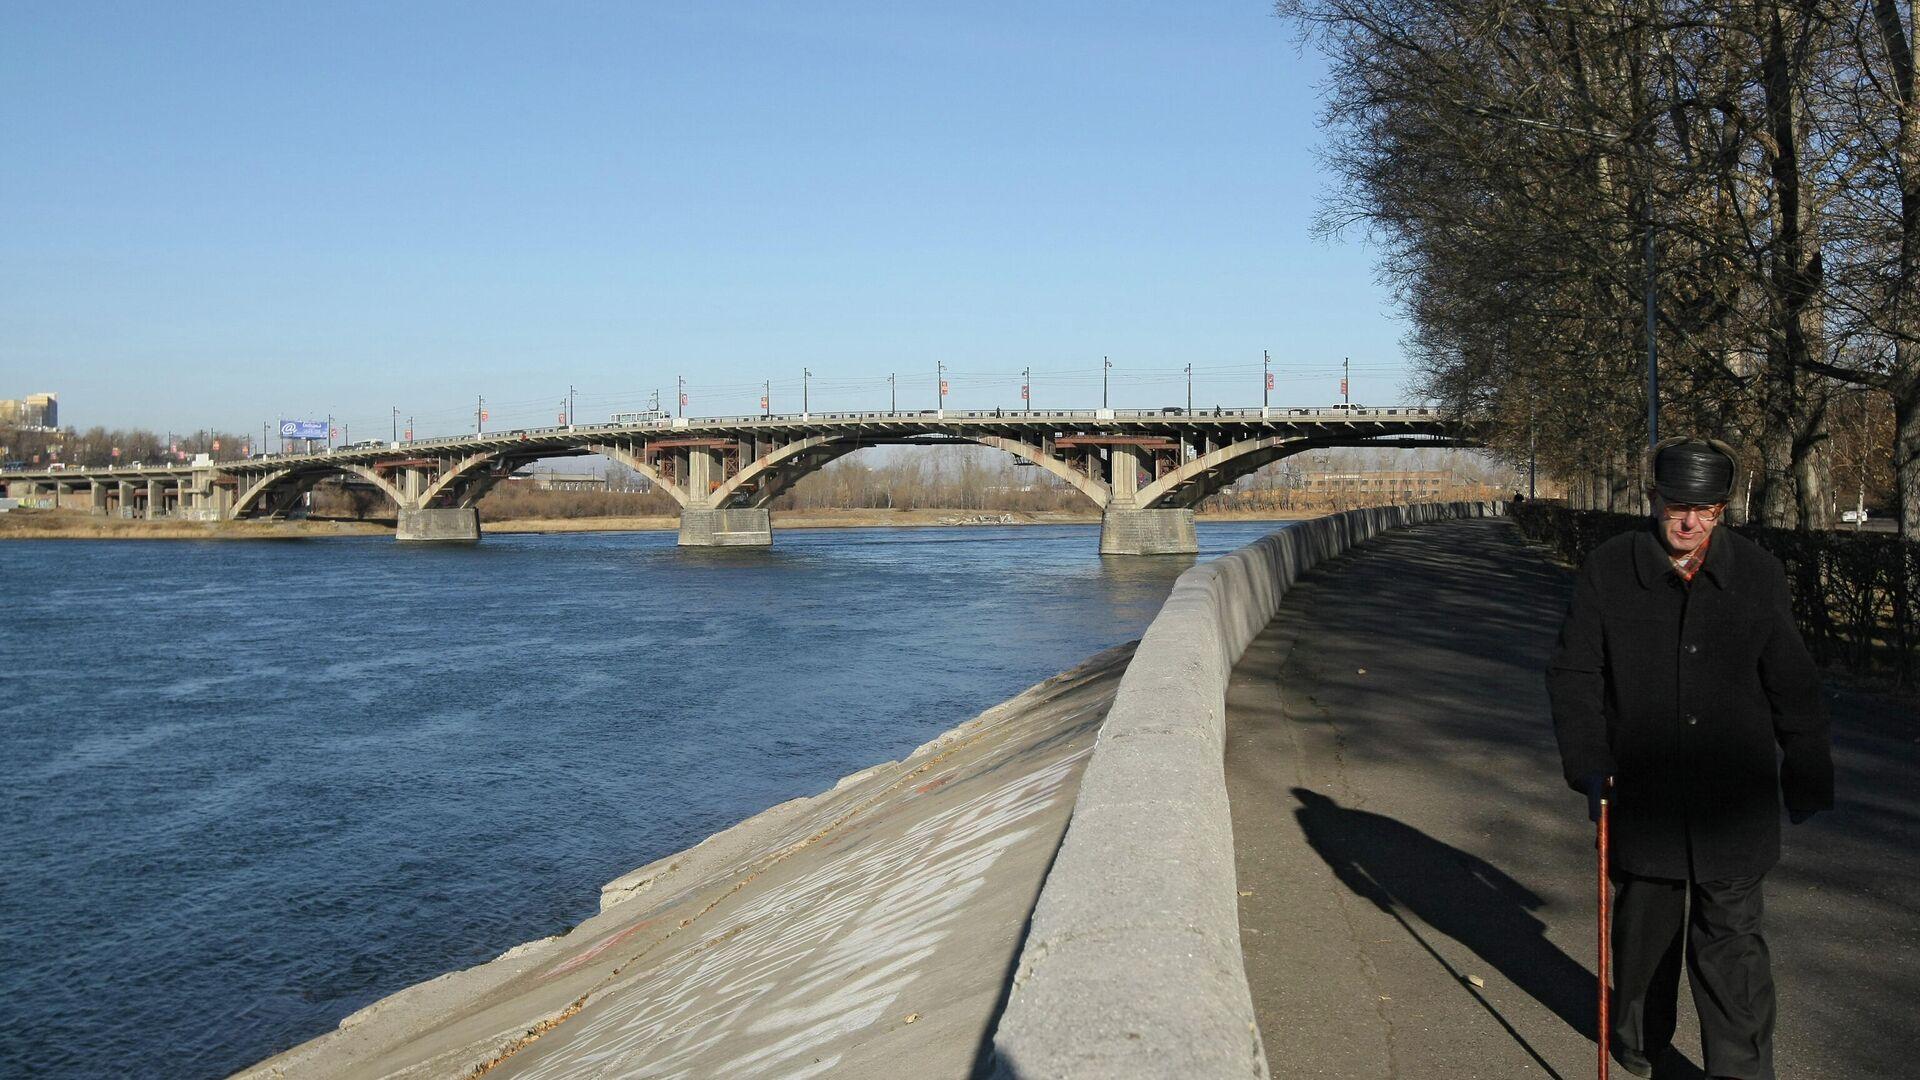 Мост через реку Ангара в Иркутске. - РИА Новости, 1920, 17.05.2021